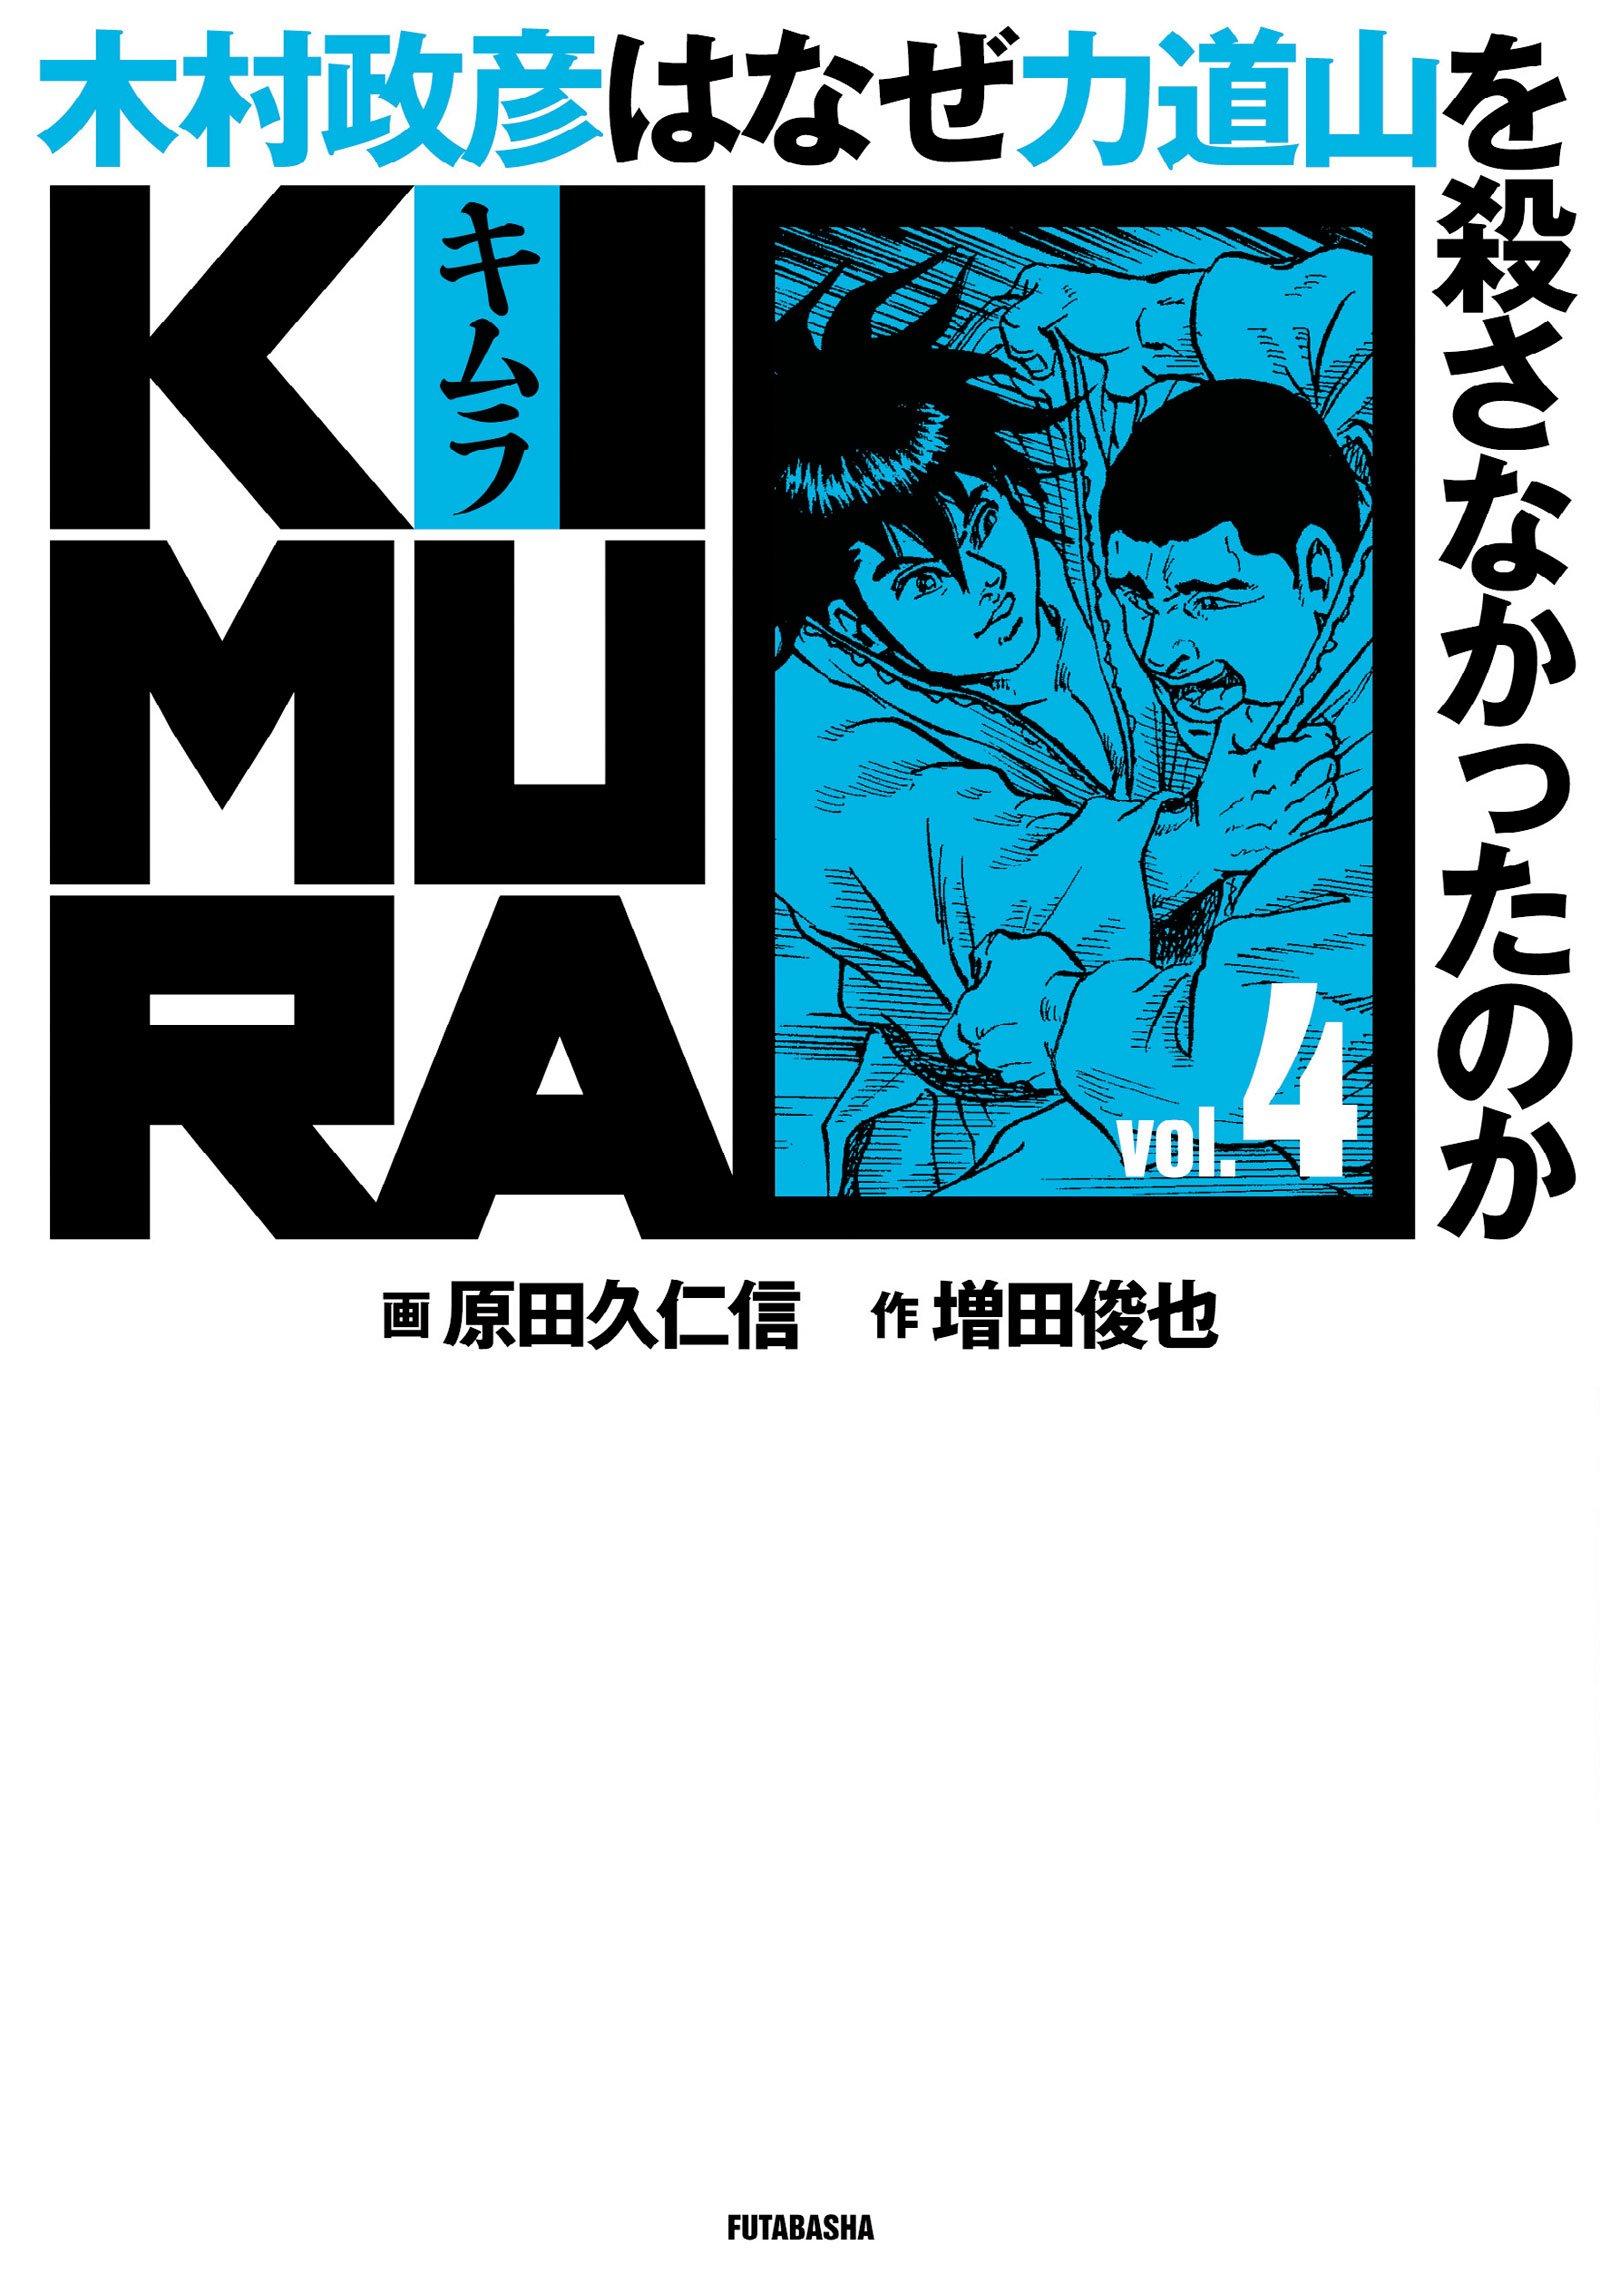 KIMURA 〜木村政彦はなぜ力道山を殺さなかったのか 5巻